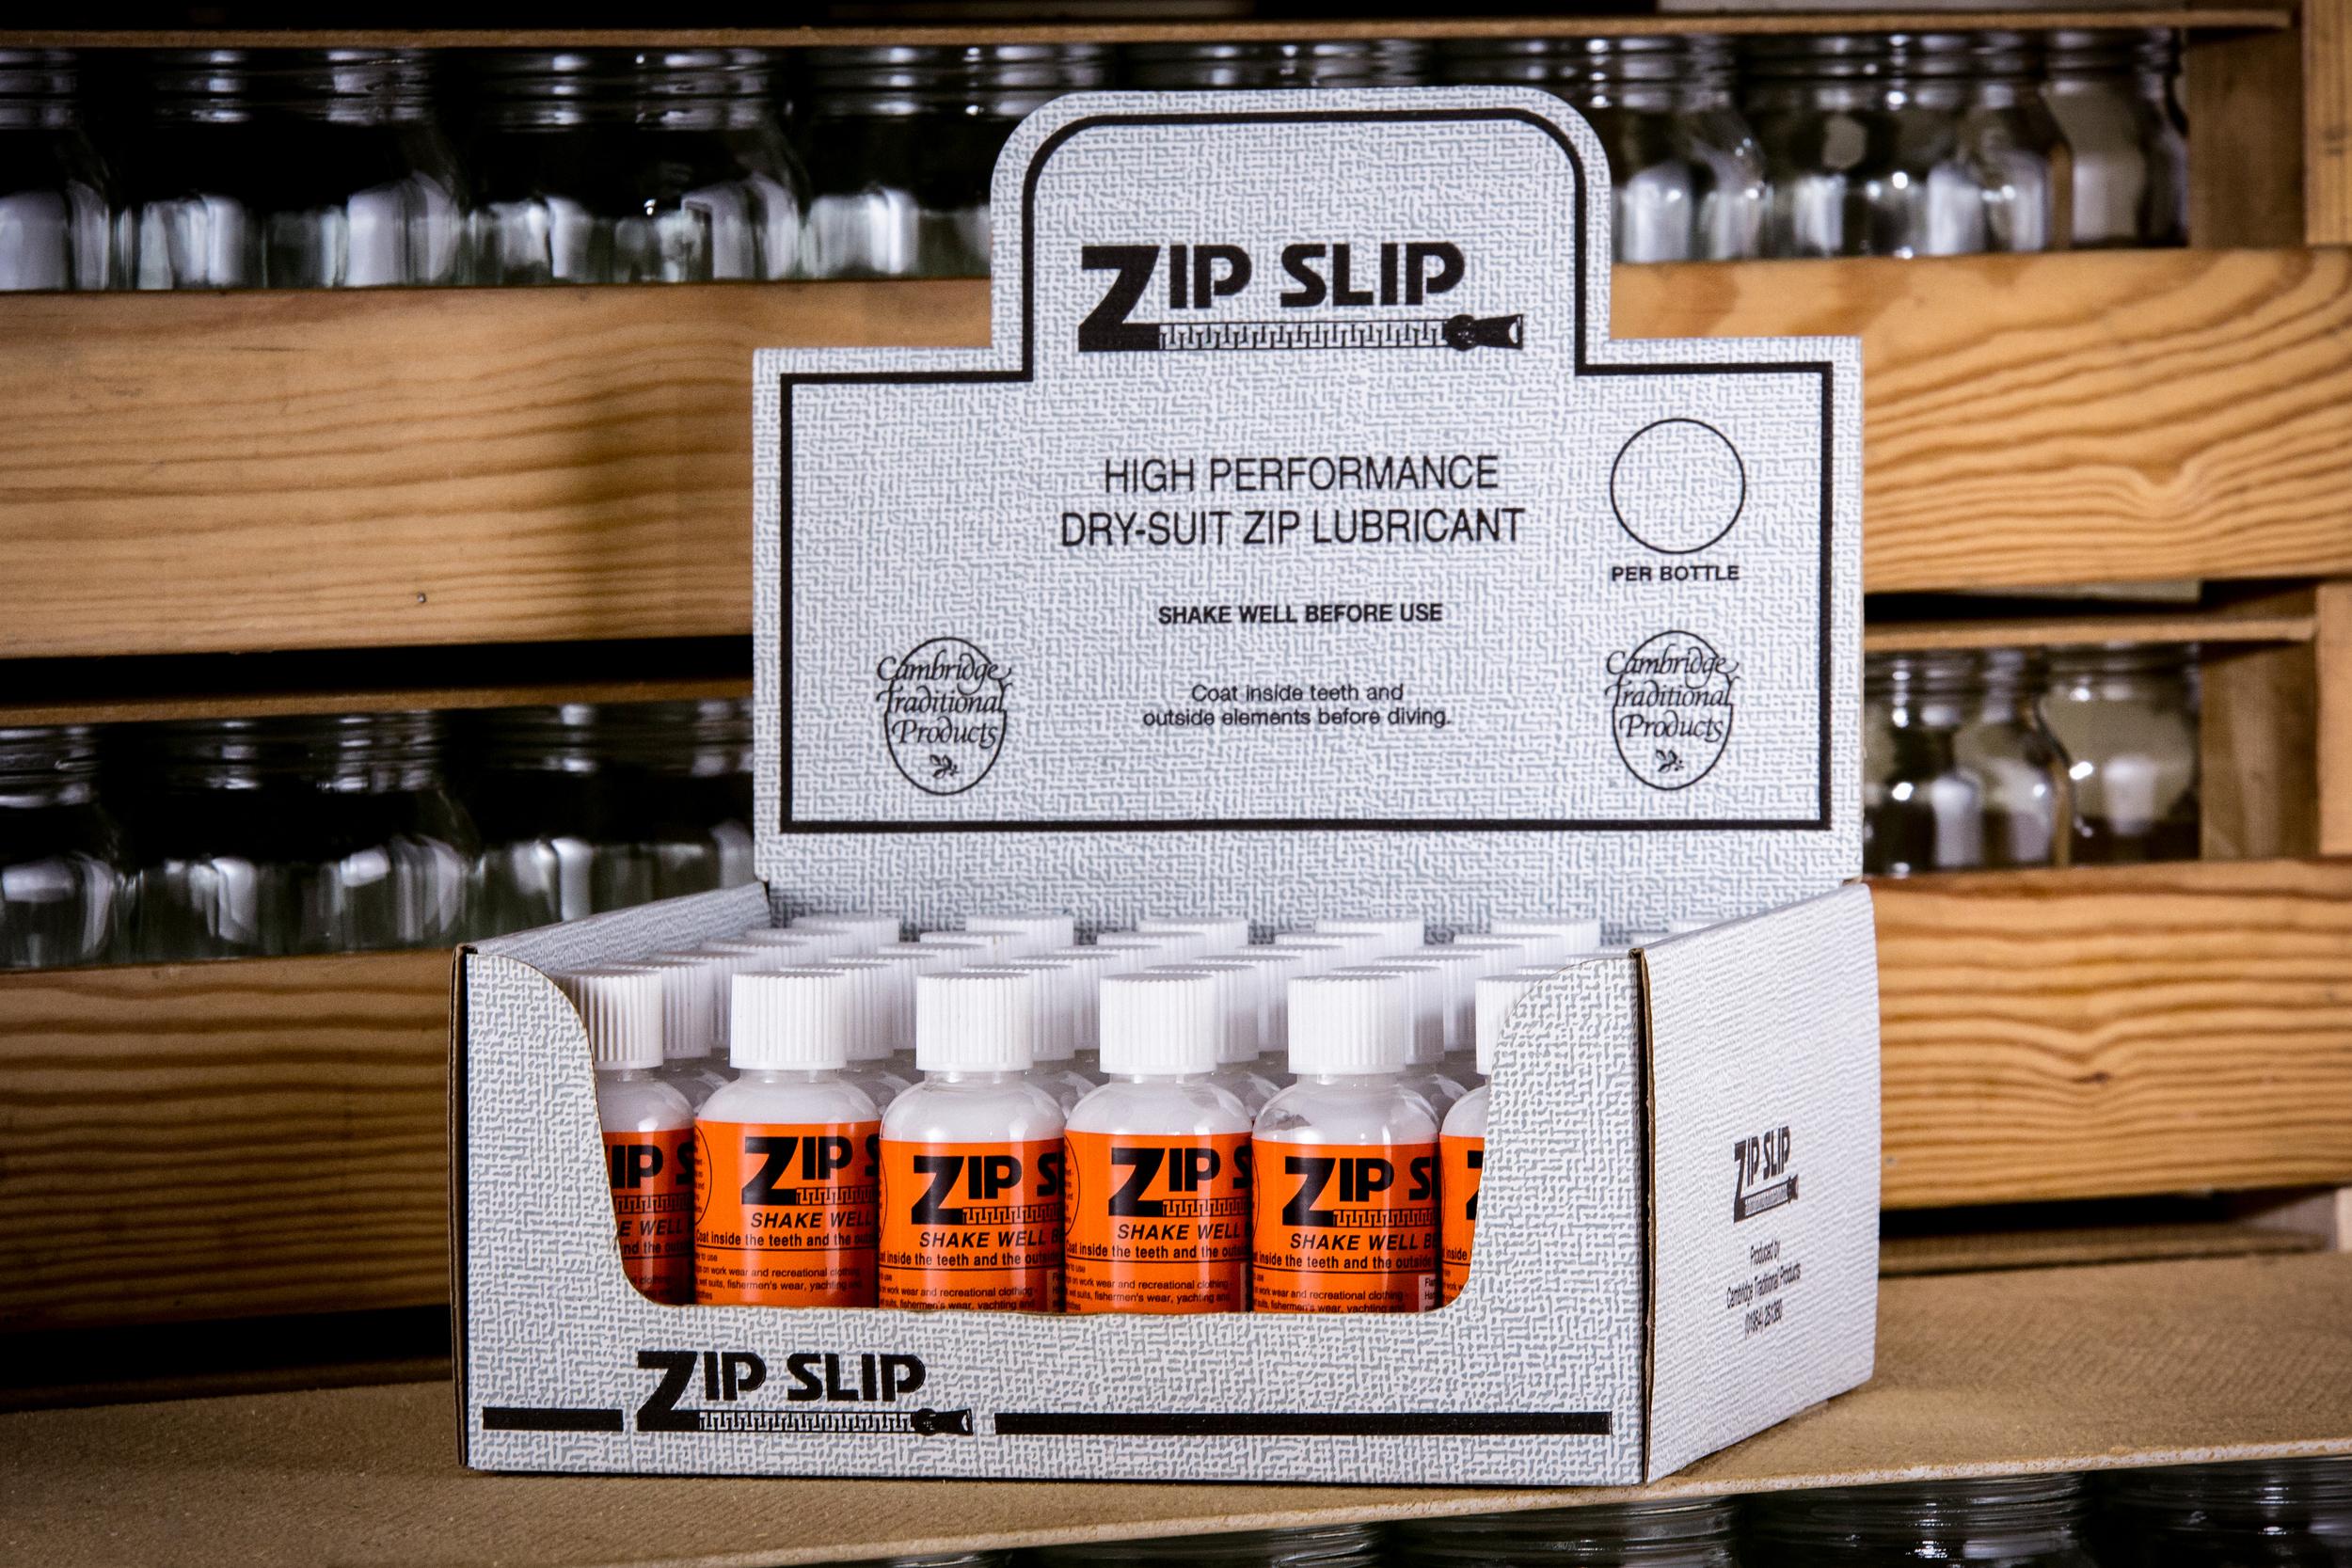 Zip-Slip in its original zip lubricant packaging